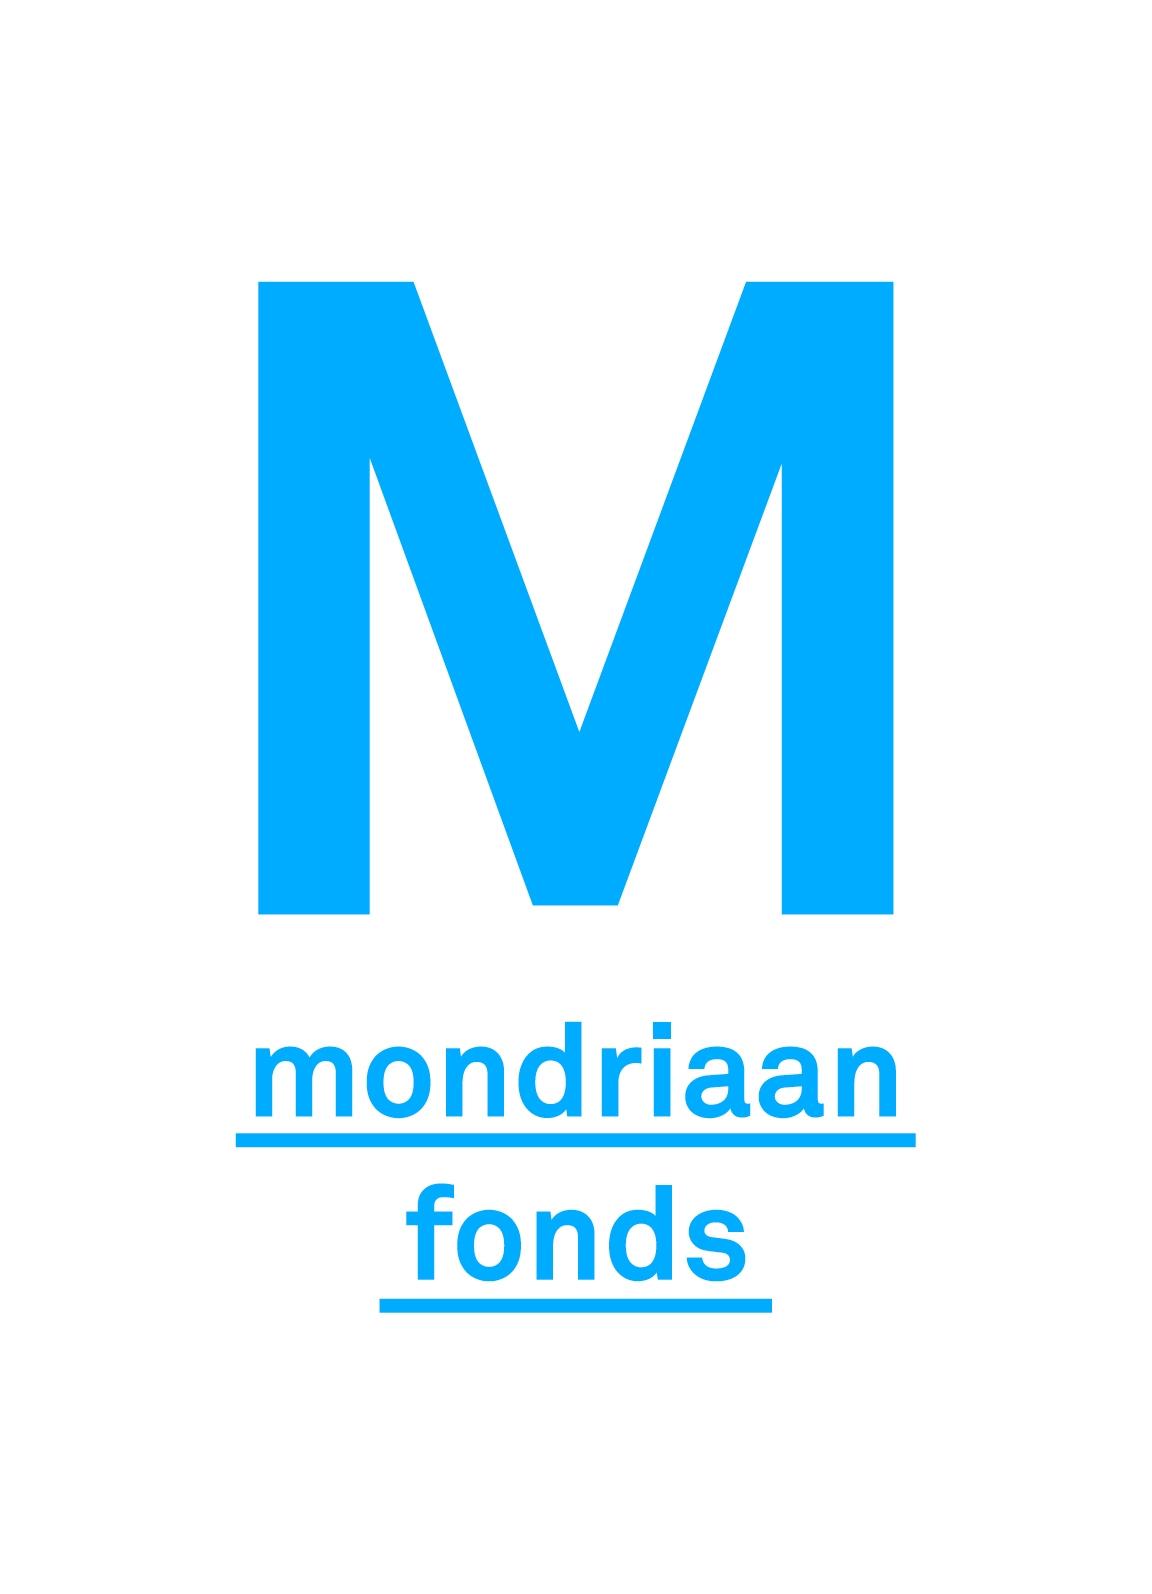 Mondriaan Fonds Logo